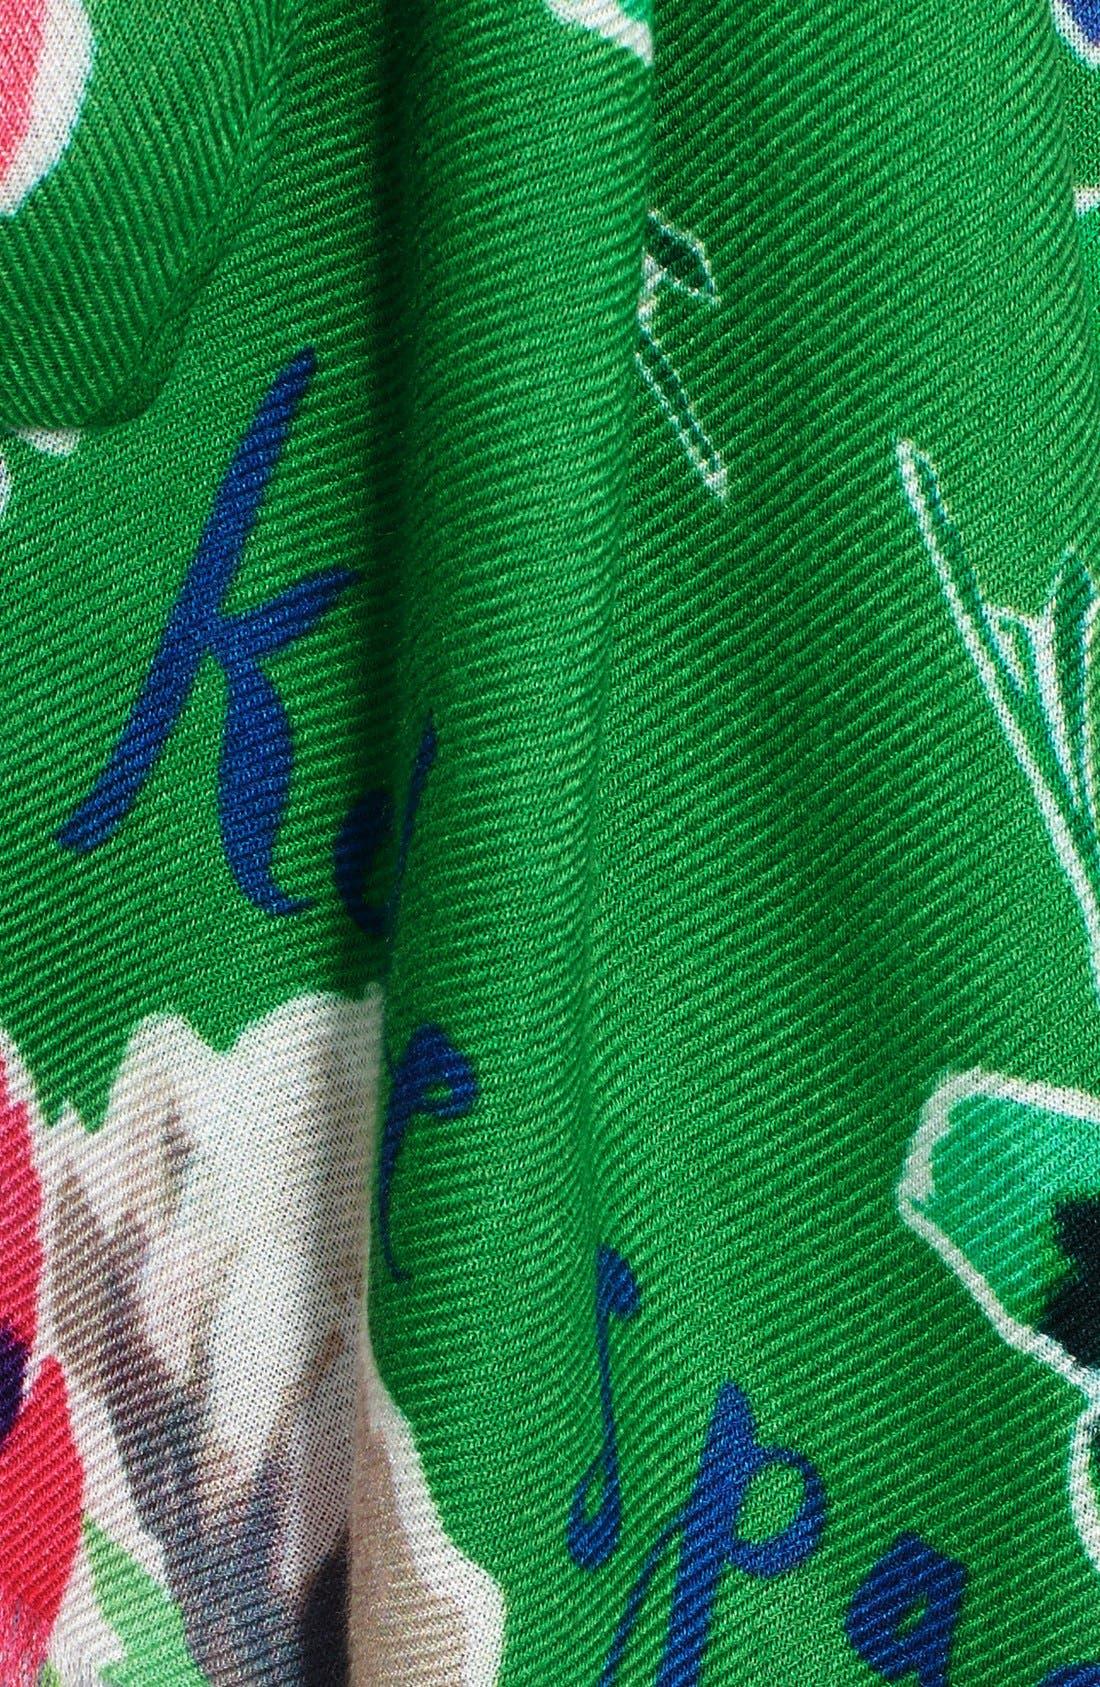 KATE SPADE NEW YORK,                             'spring blooms' scarf,                             Alternate thumbnail 3, color,                             300